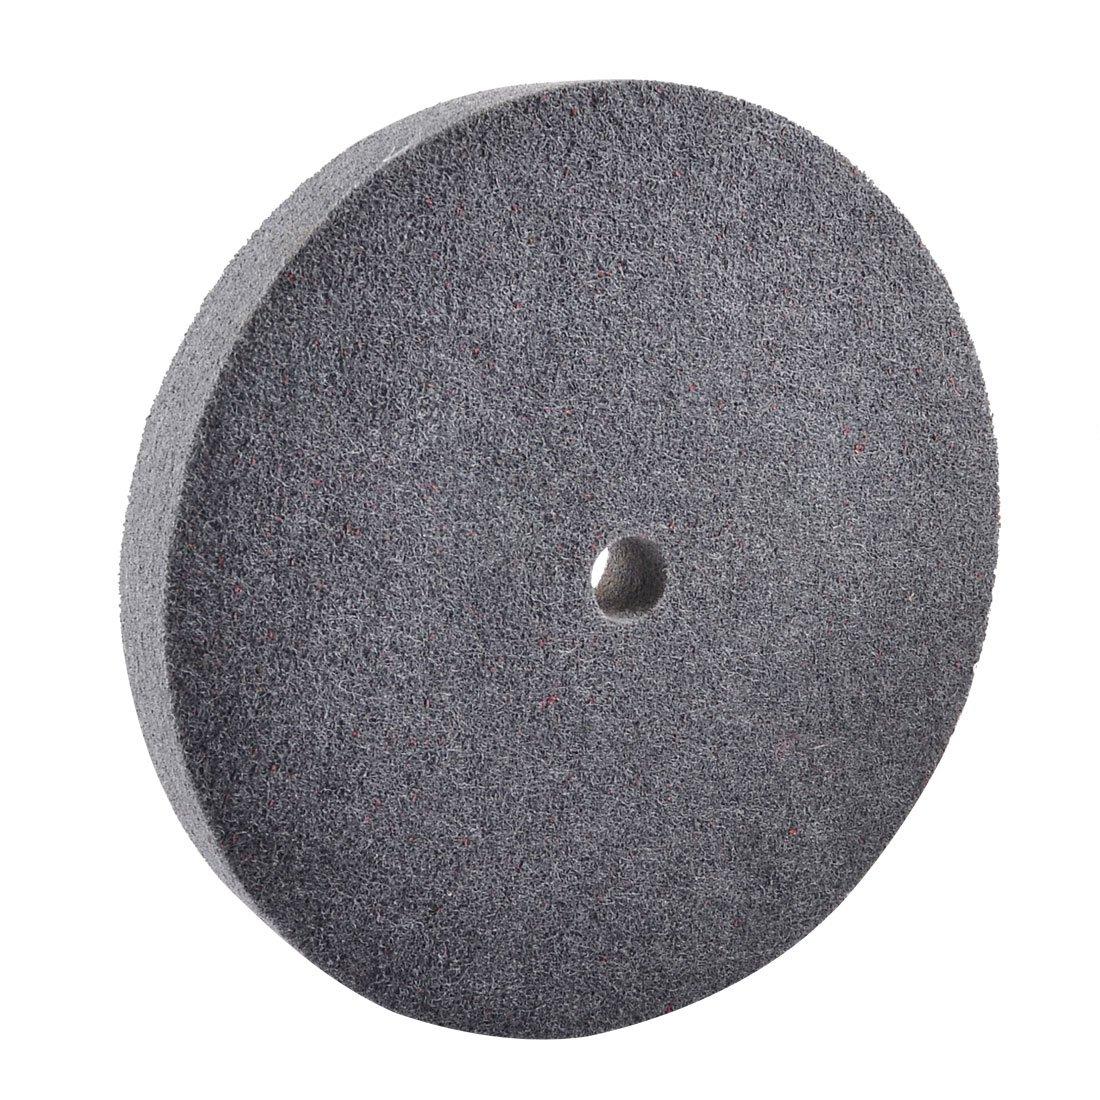 uxcell 8'' Outside Dia 12P 320# Grit Dark Gray Nylon Polishing Wheel Disc Pad